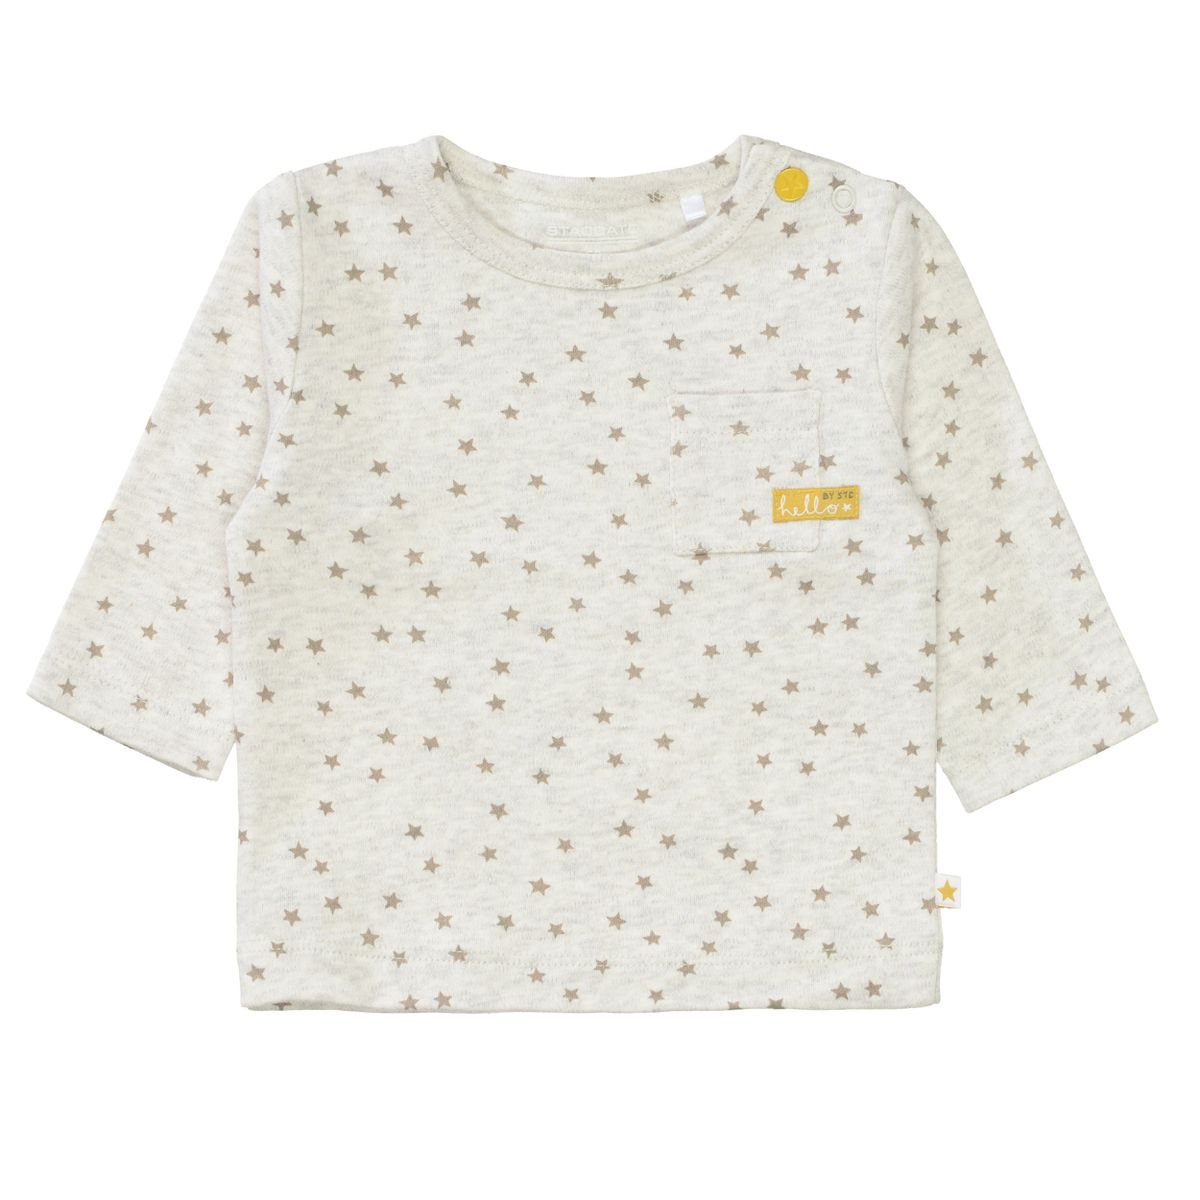 ORGANIC COTTON Langarmshirt mit Allover-Print - Soft White